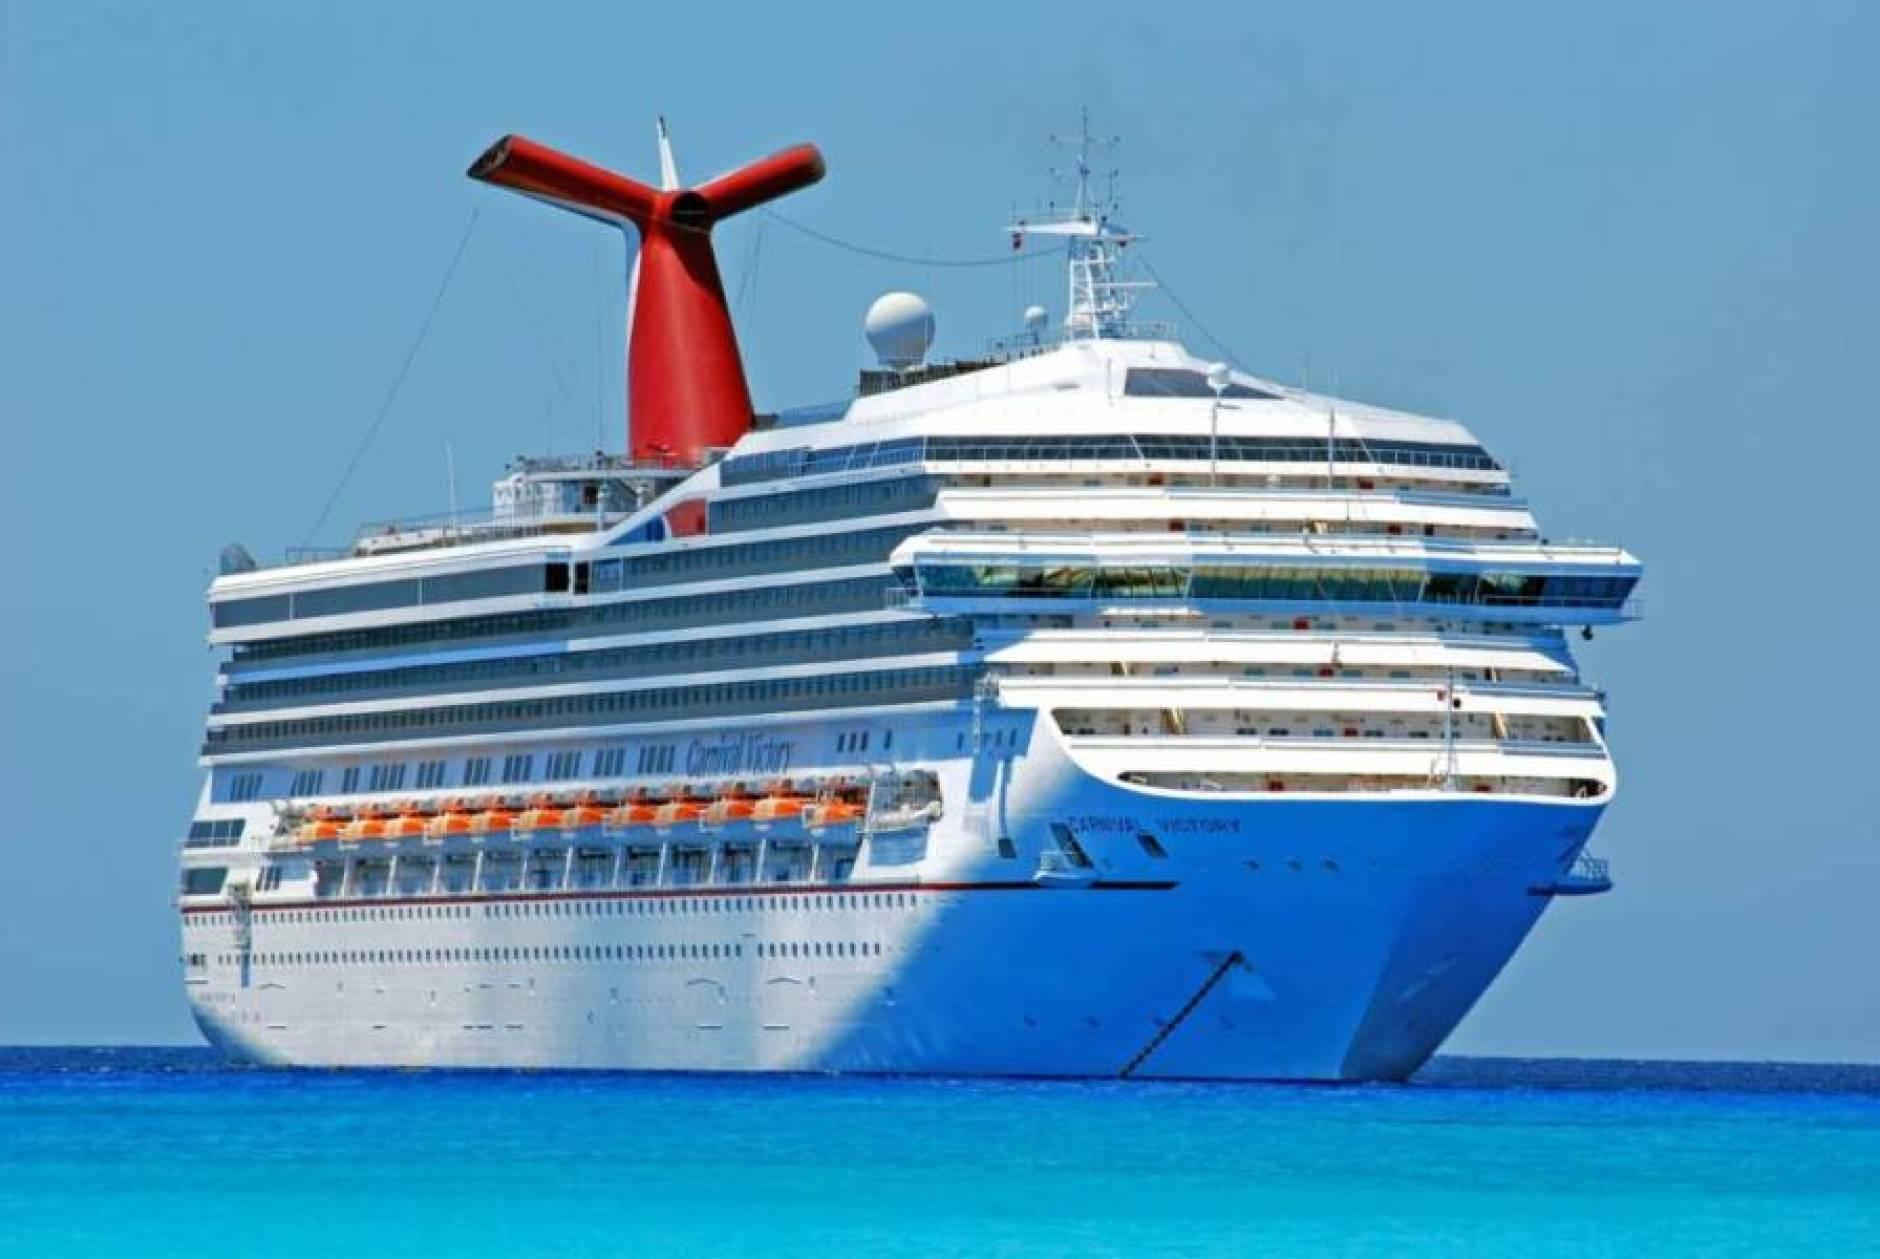 sea holiday vacation blue